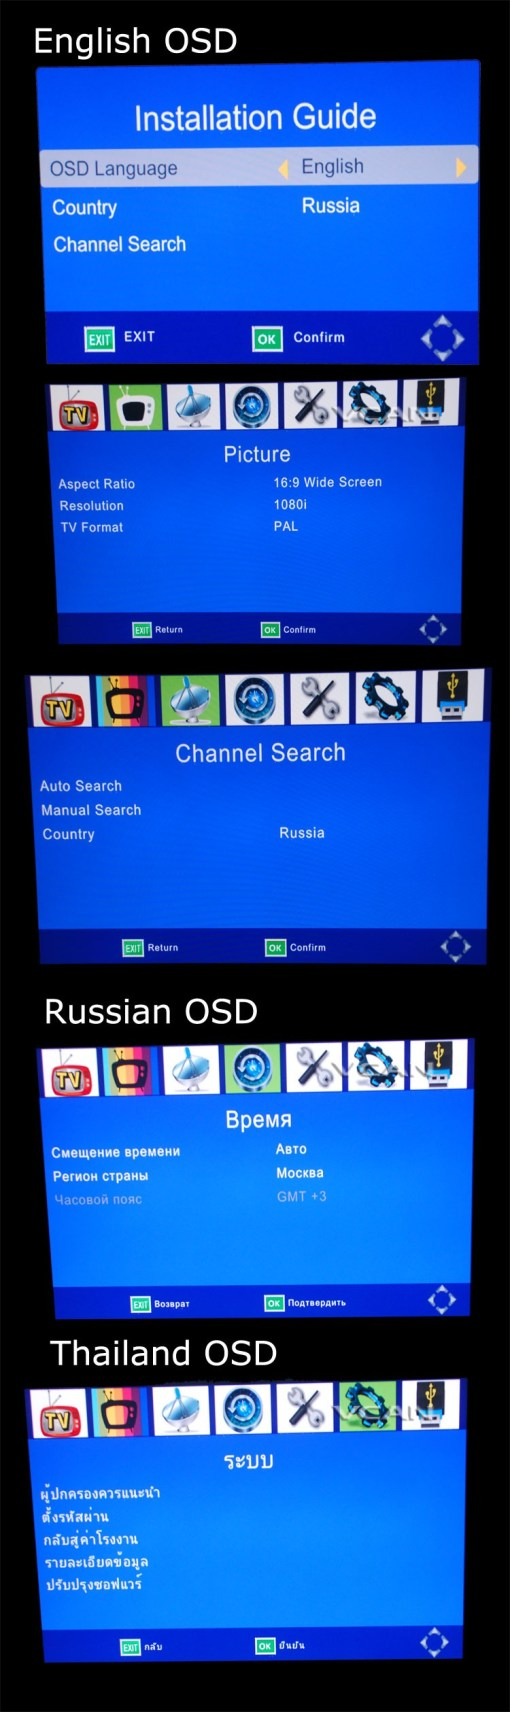 2 antenna car DVB-T2 Two tuner tv Diversity USB HDMI HDTV High Speed dvb-t22 5